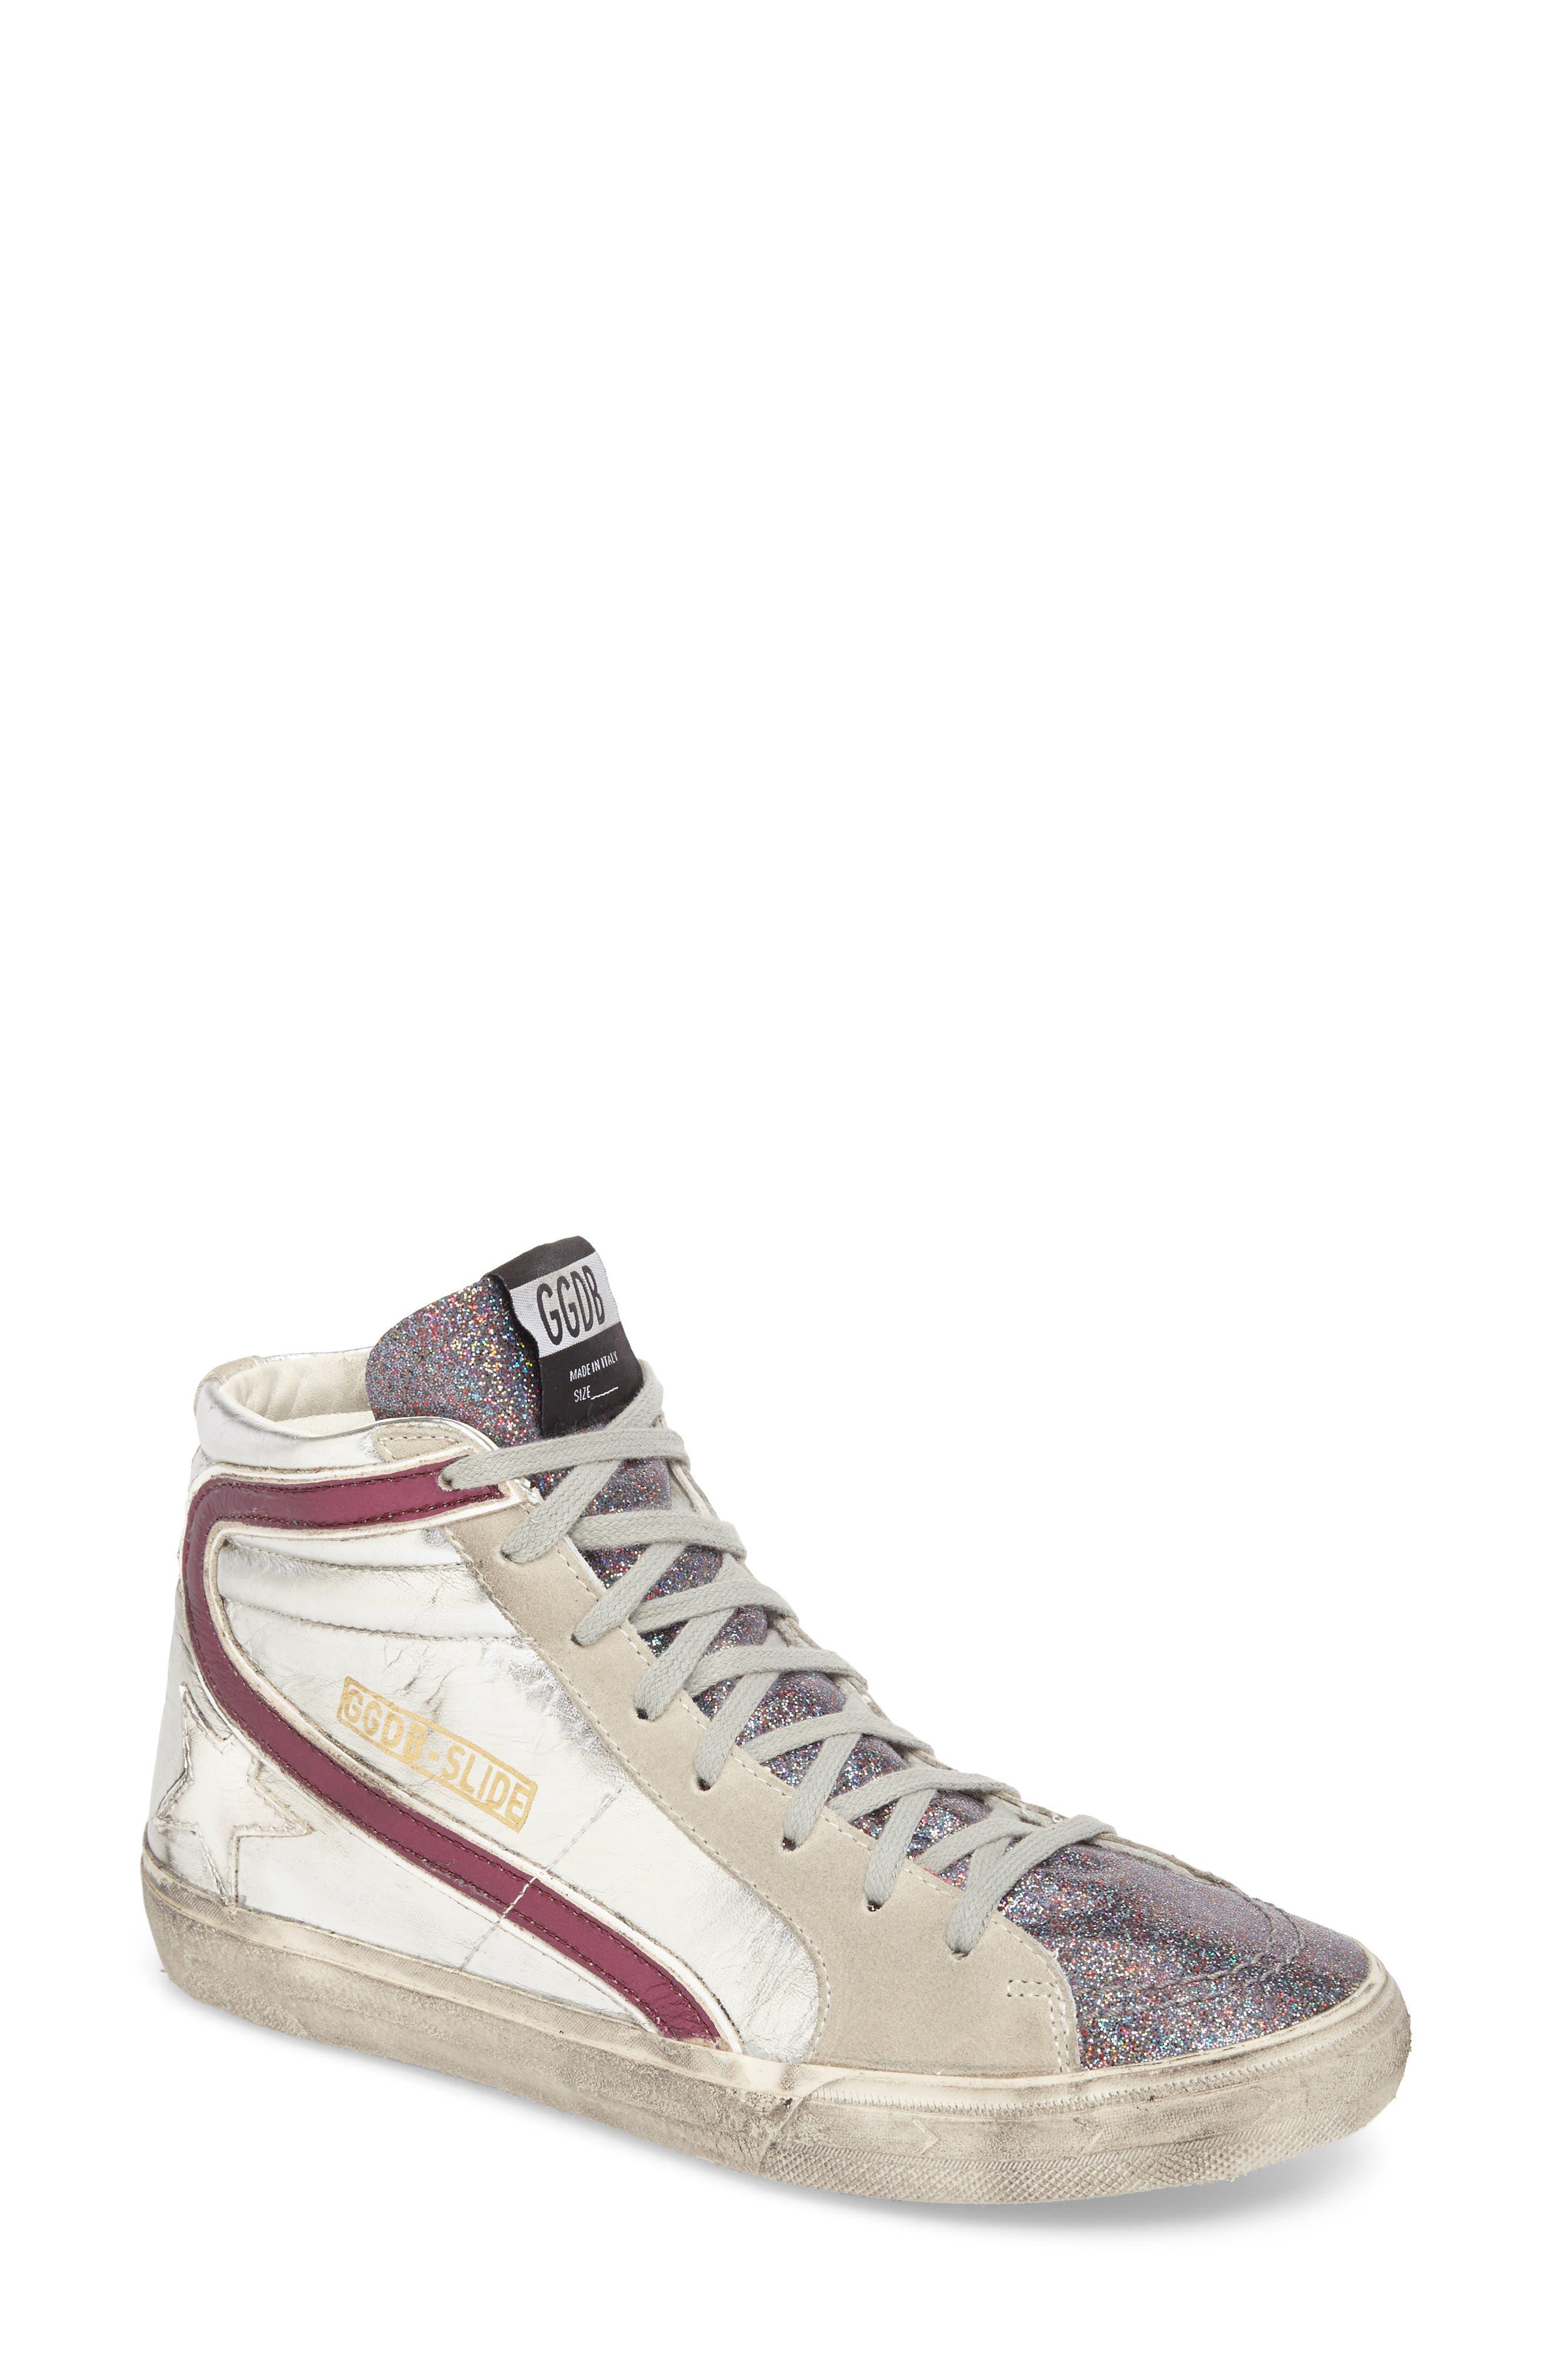 Slide High Top Sneaker,                             Main thumbnail 1, color,                             040